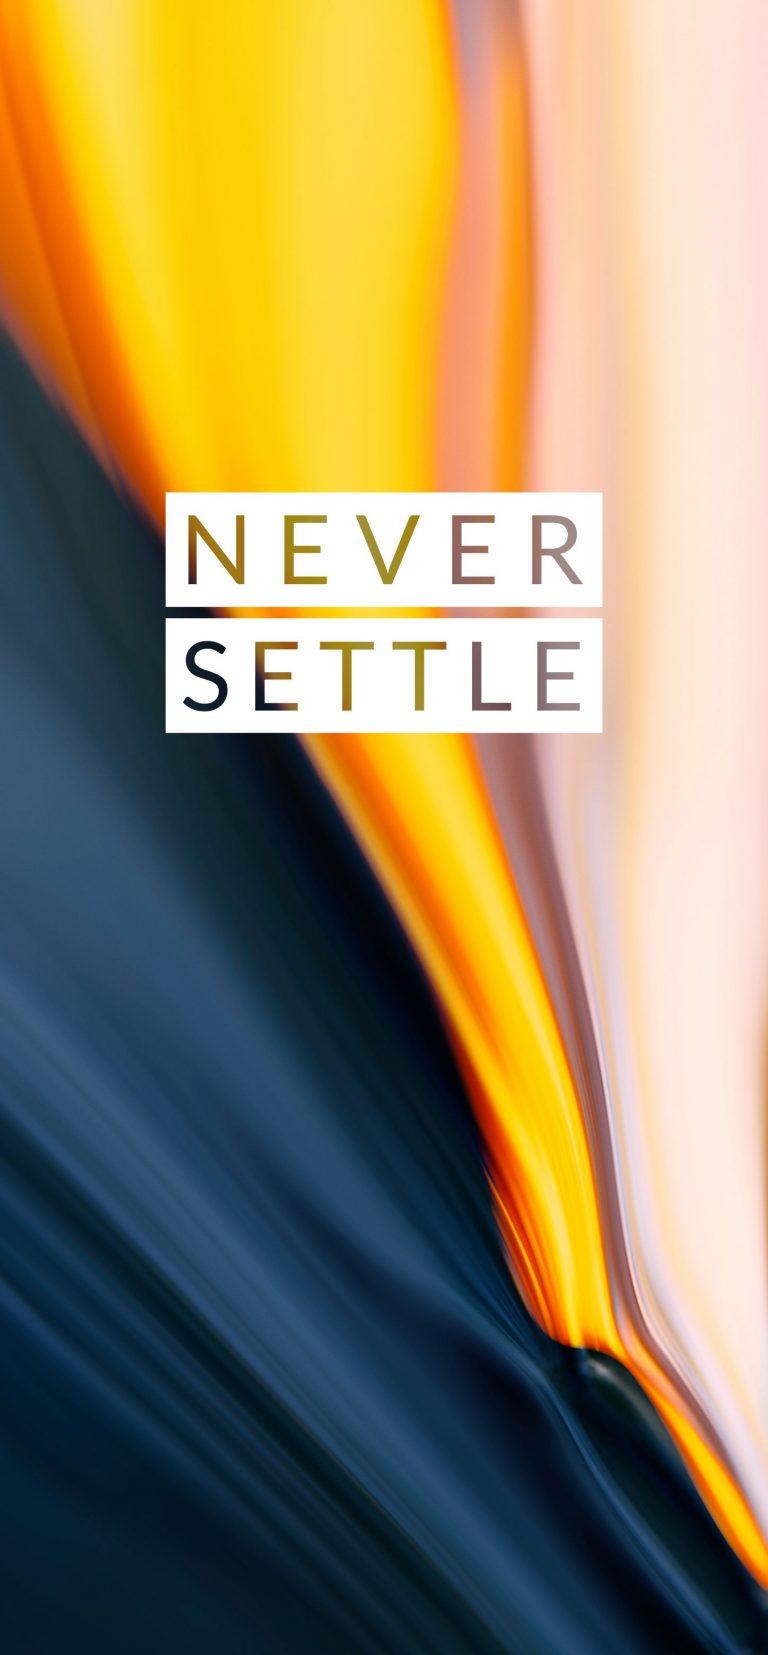 OnePlus 7 Never Settle Wallpaper 02 1448x3120 768x1655